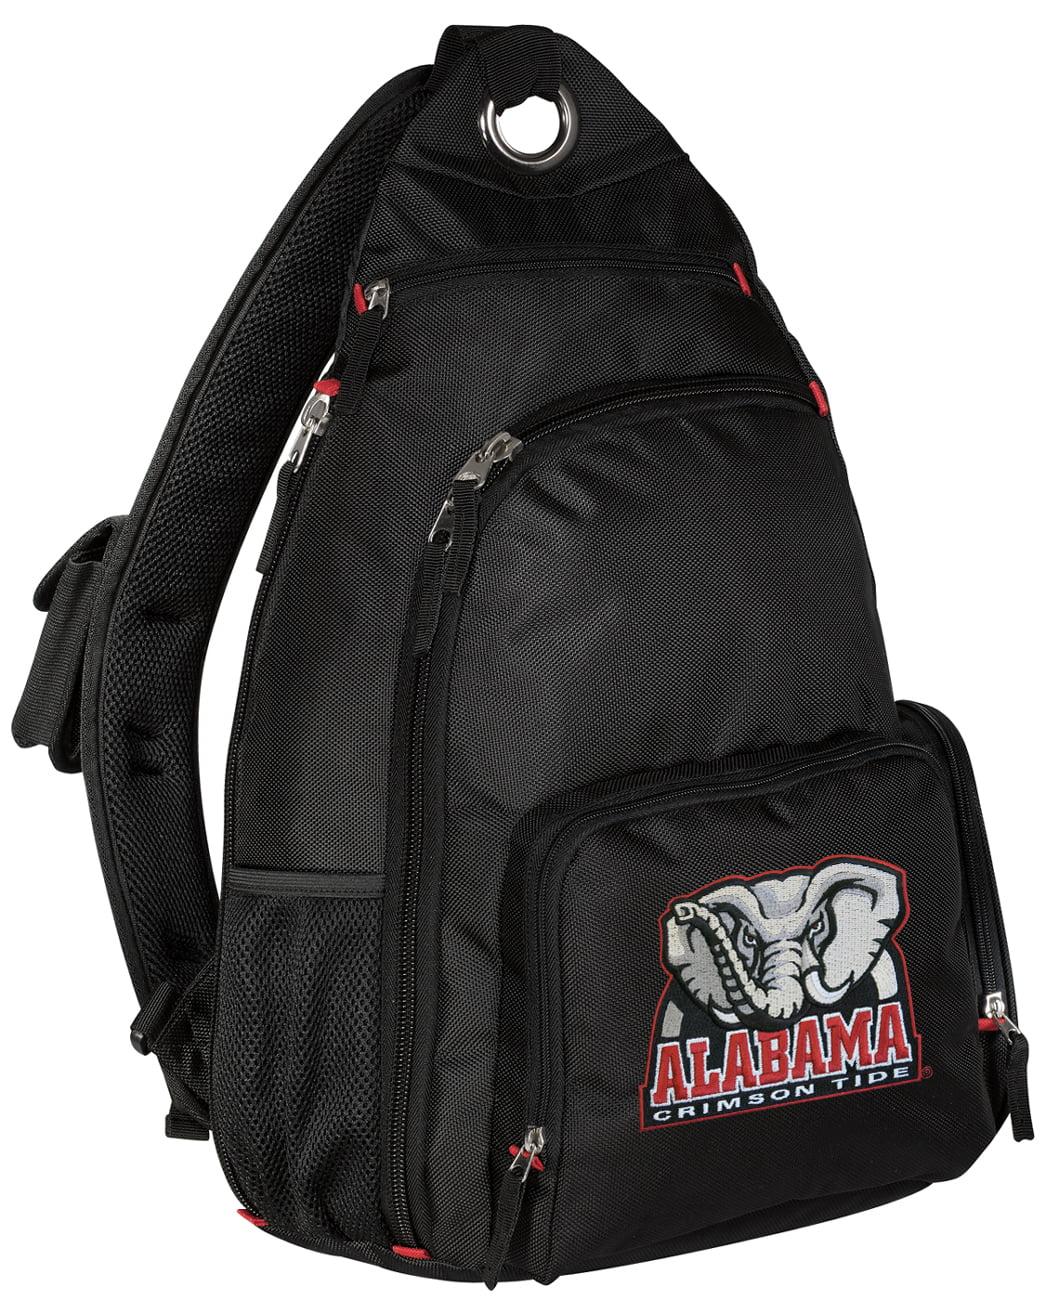 Alabama Backpack Single Strap OFFICIAL University of Alabama Sling Backpack by